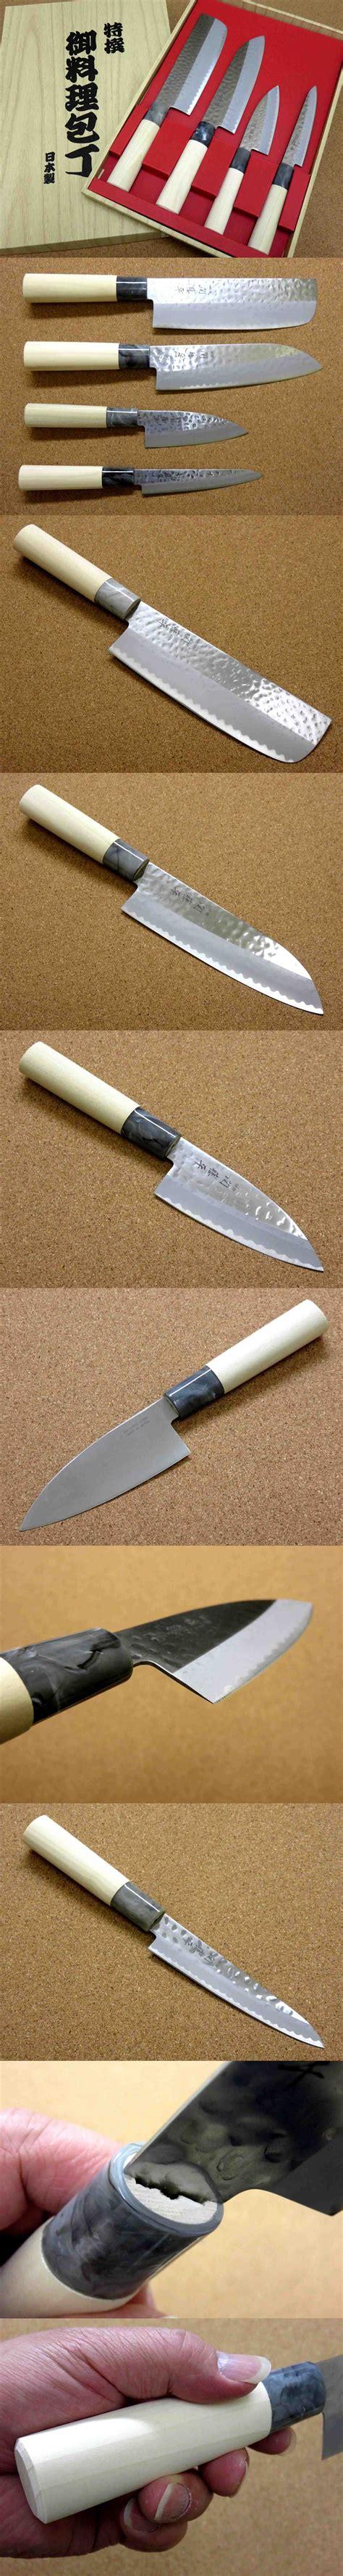 sushi ceramic japanese kitchen knife set santoku nakiri japanese yaxell seki tobei kitchen knife 4 sets santoku